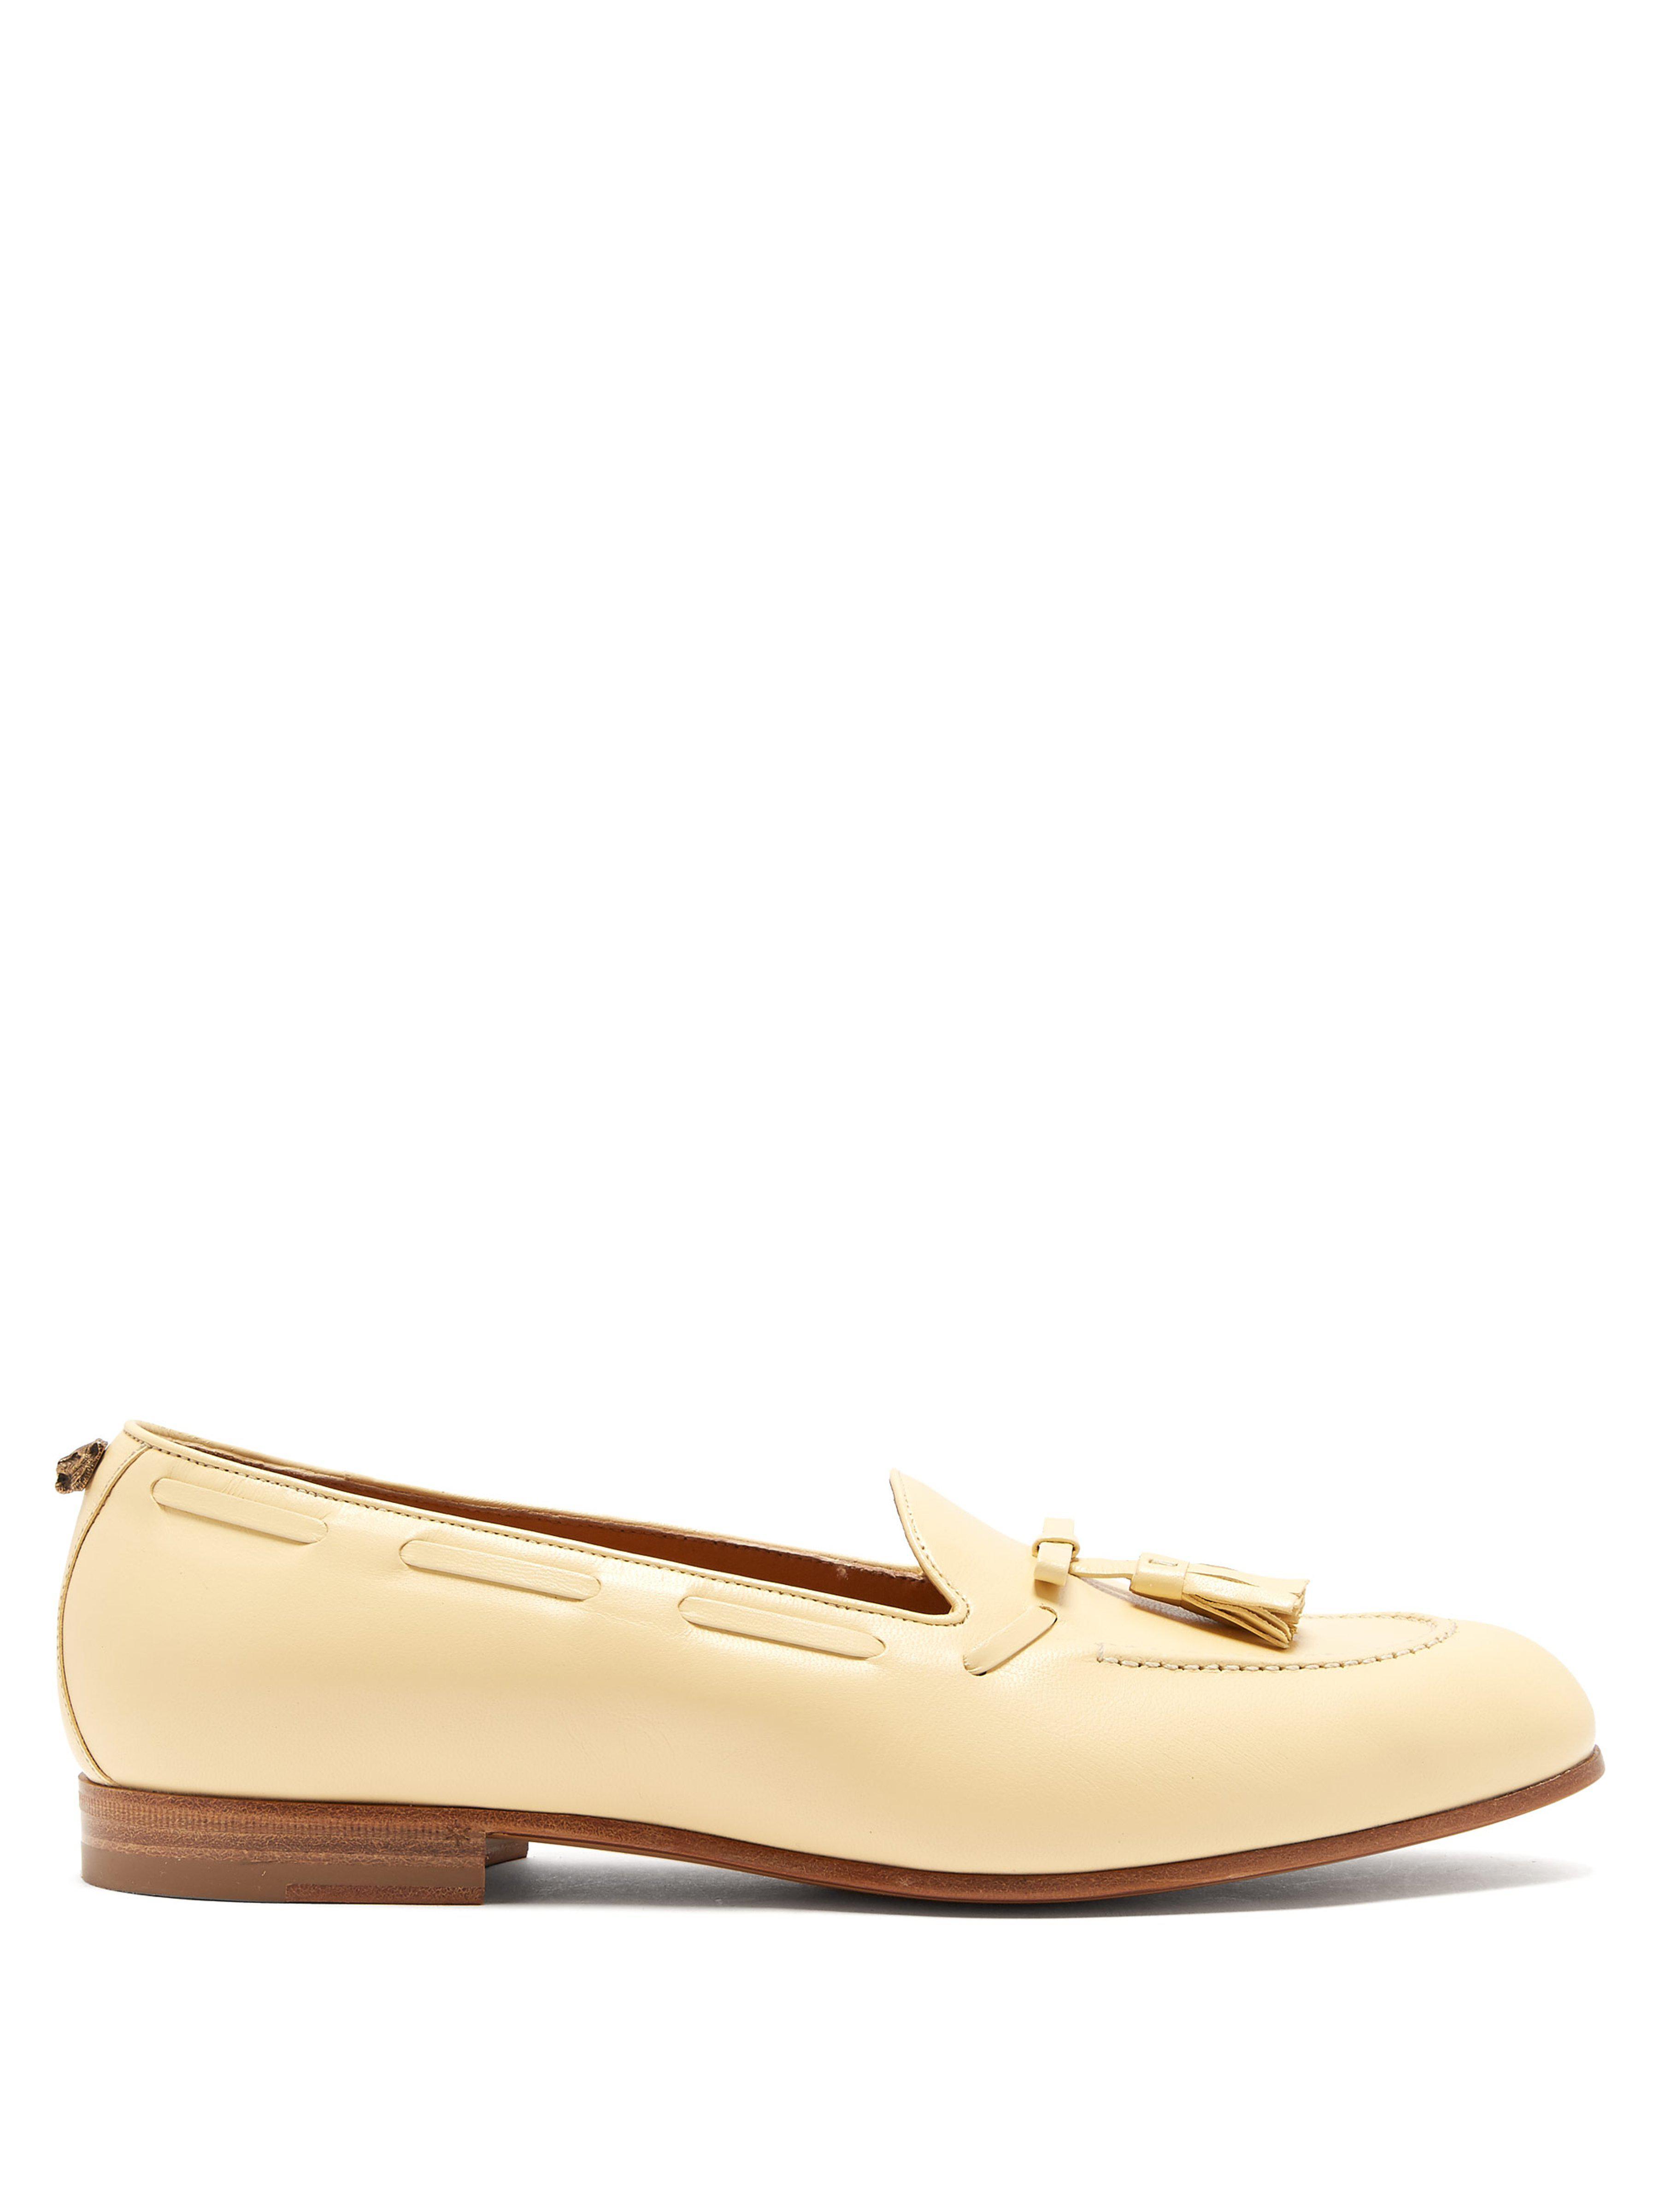 533e25e9dab Gucci Quentin Tassel Leather Loafers for Men - Lyst